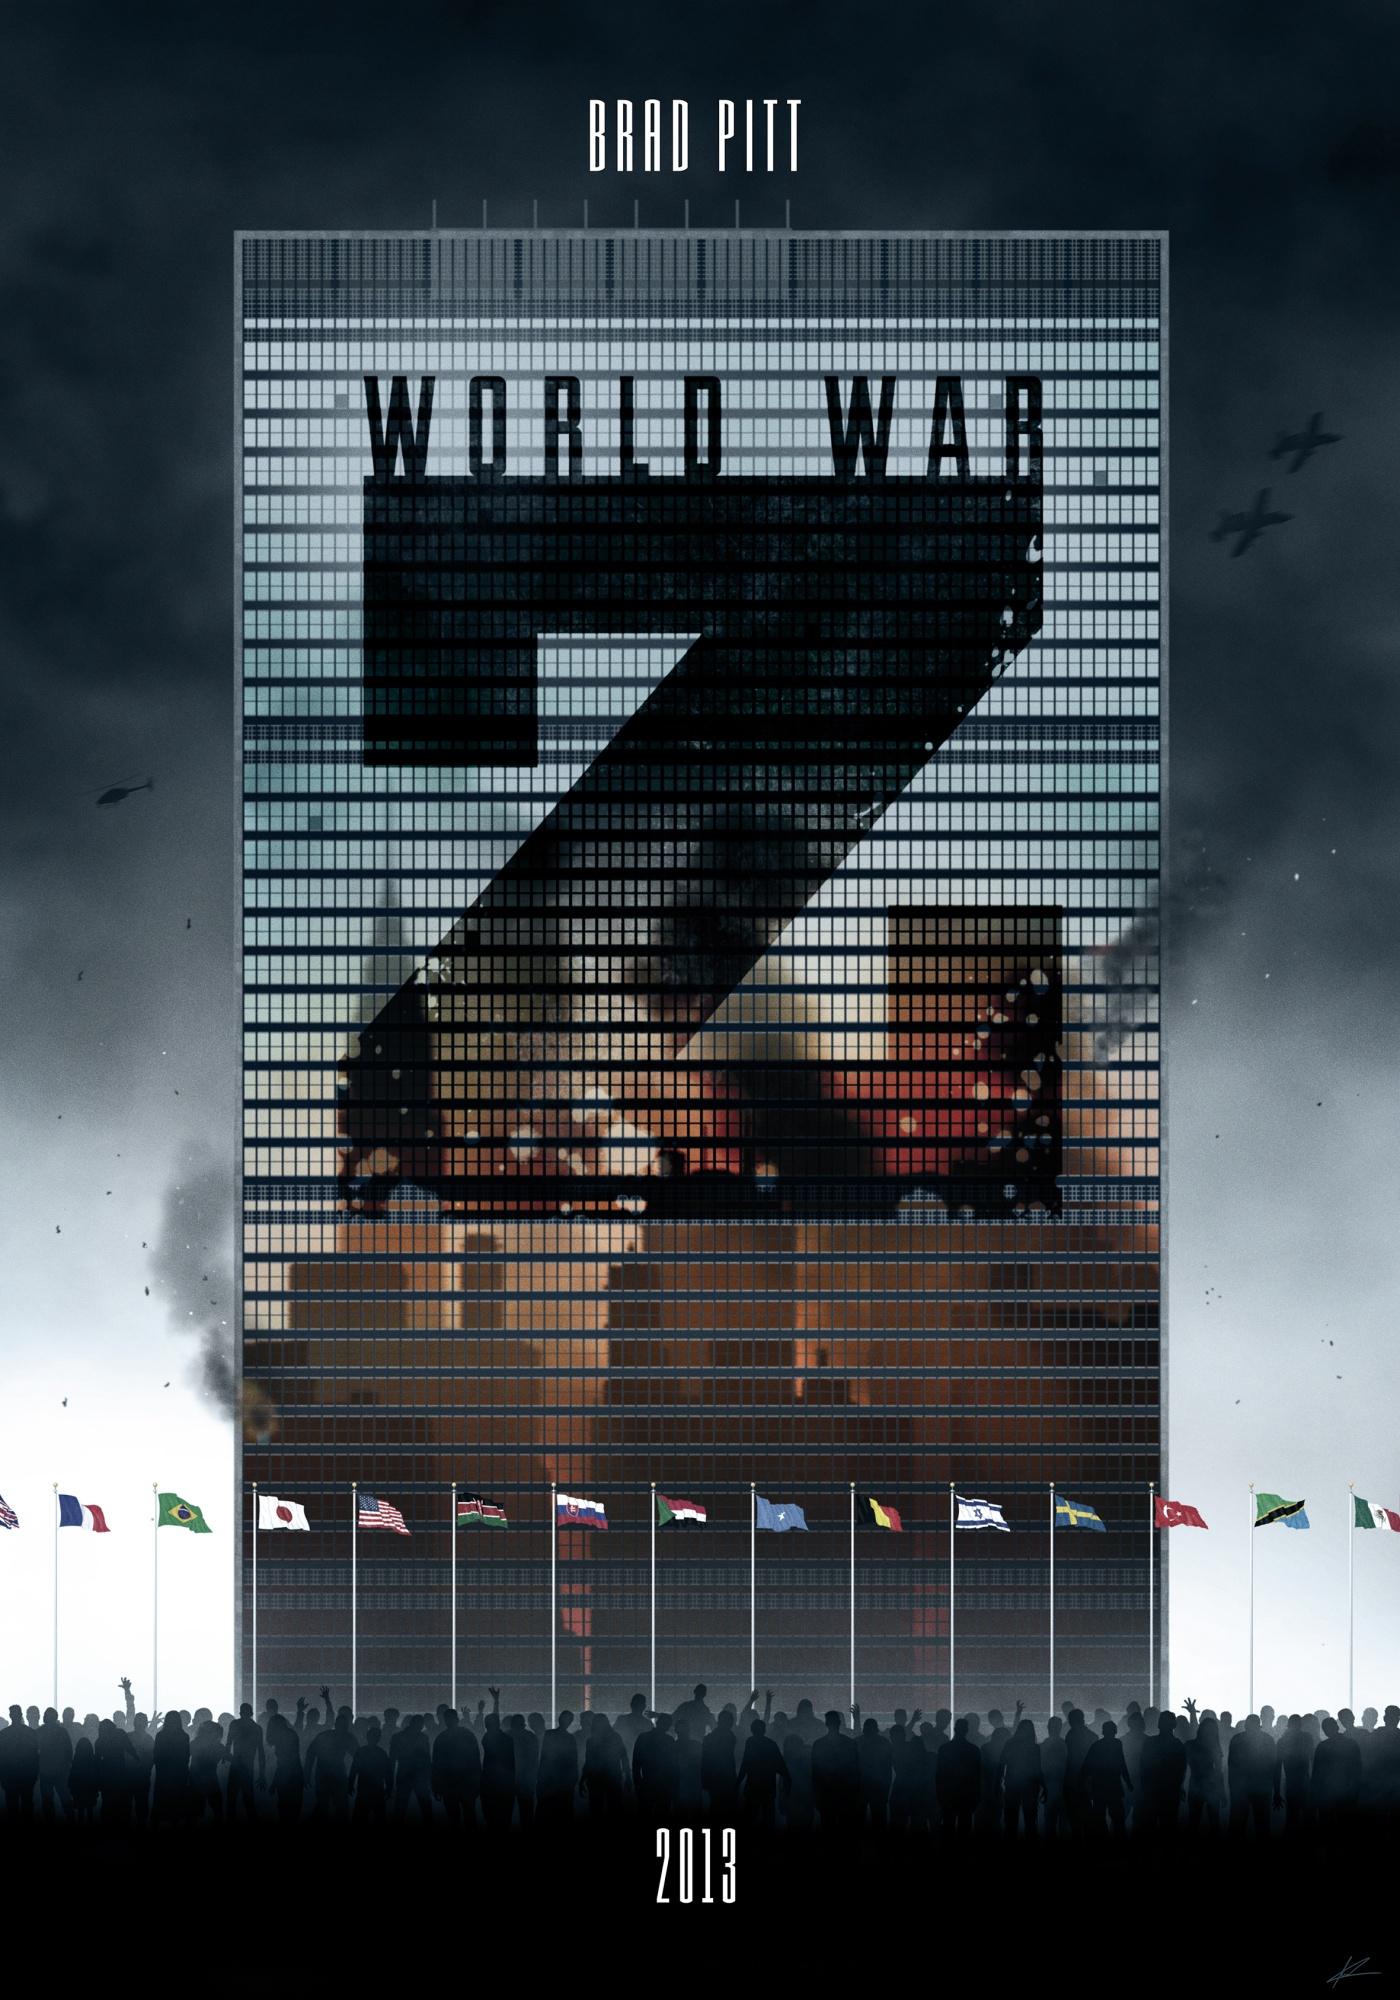 World War Z by Marko Manev